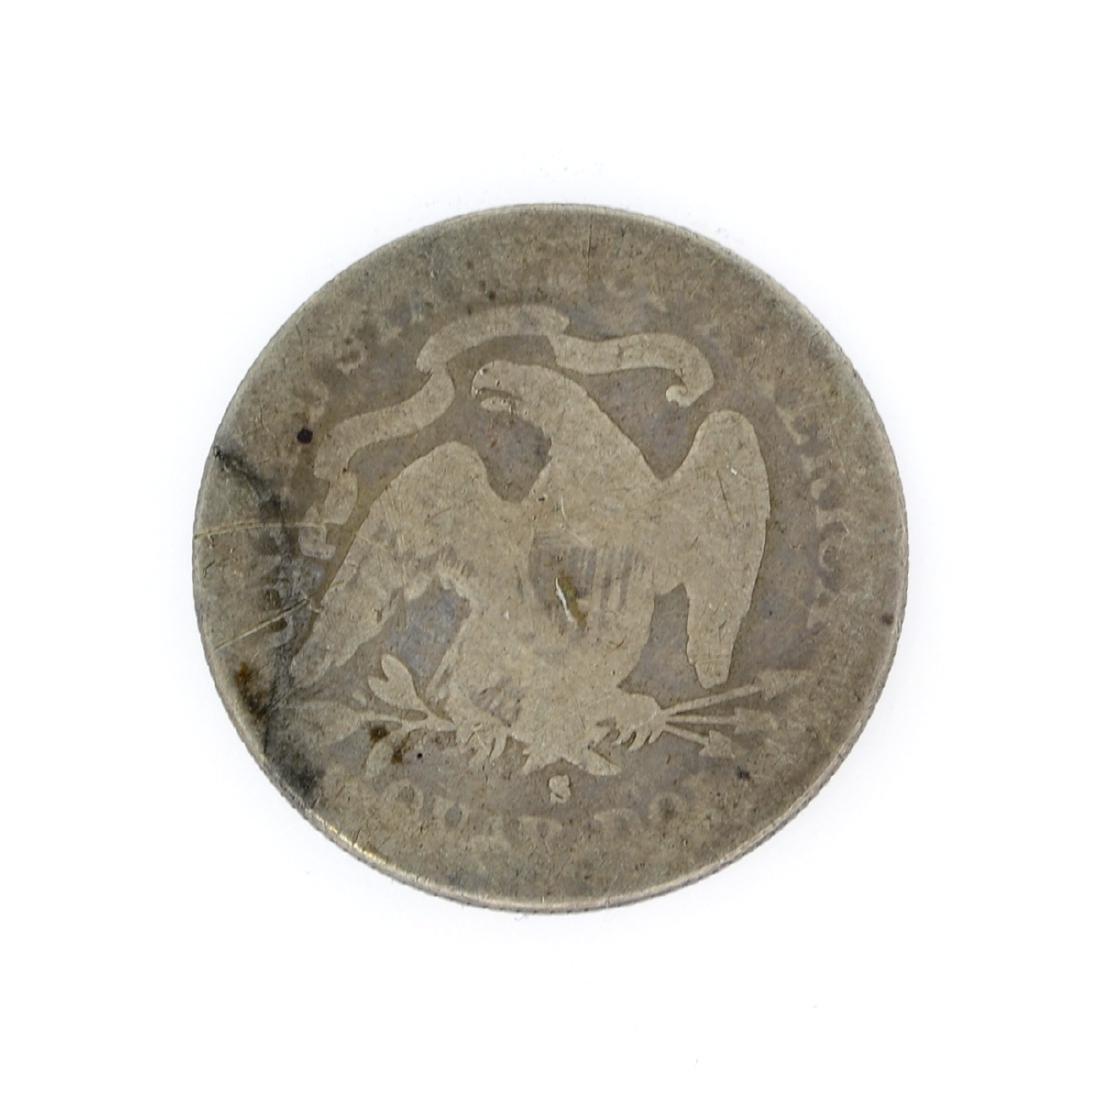 Rare 1877-S Liberty Seated Quarter Dollar Coin - 2